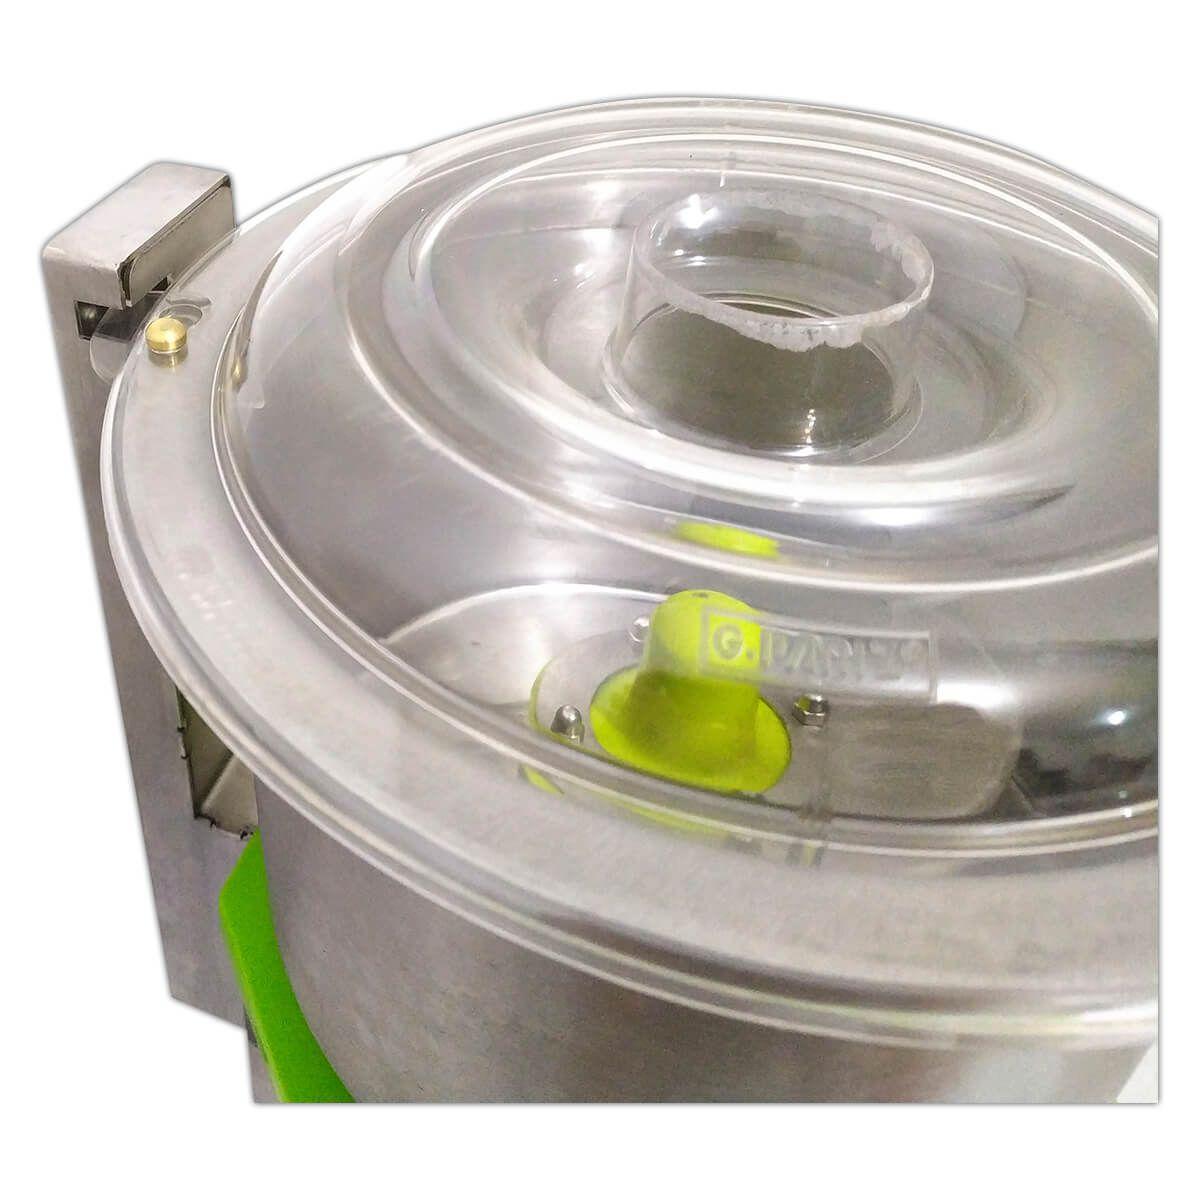 Processador De Alimentos Industrial Cutter 5 Litros 1/2Cv Inox - G-Paniz - 220V